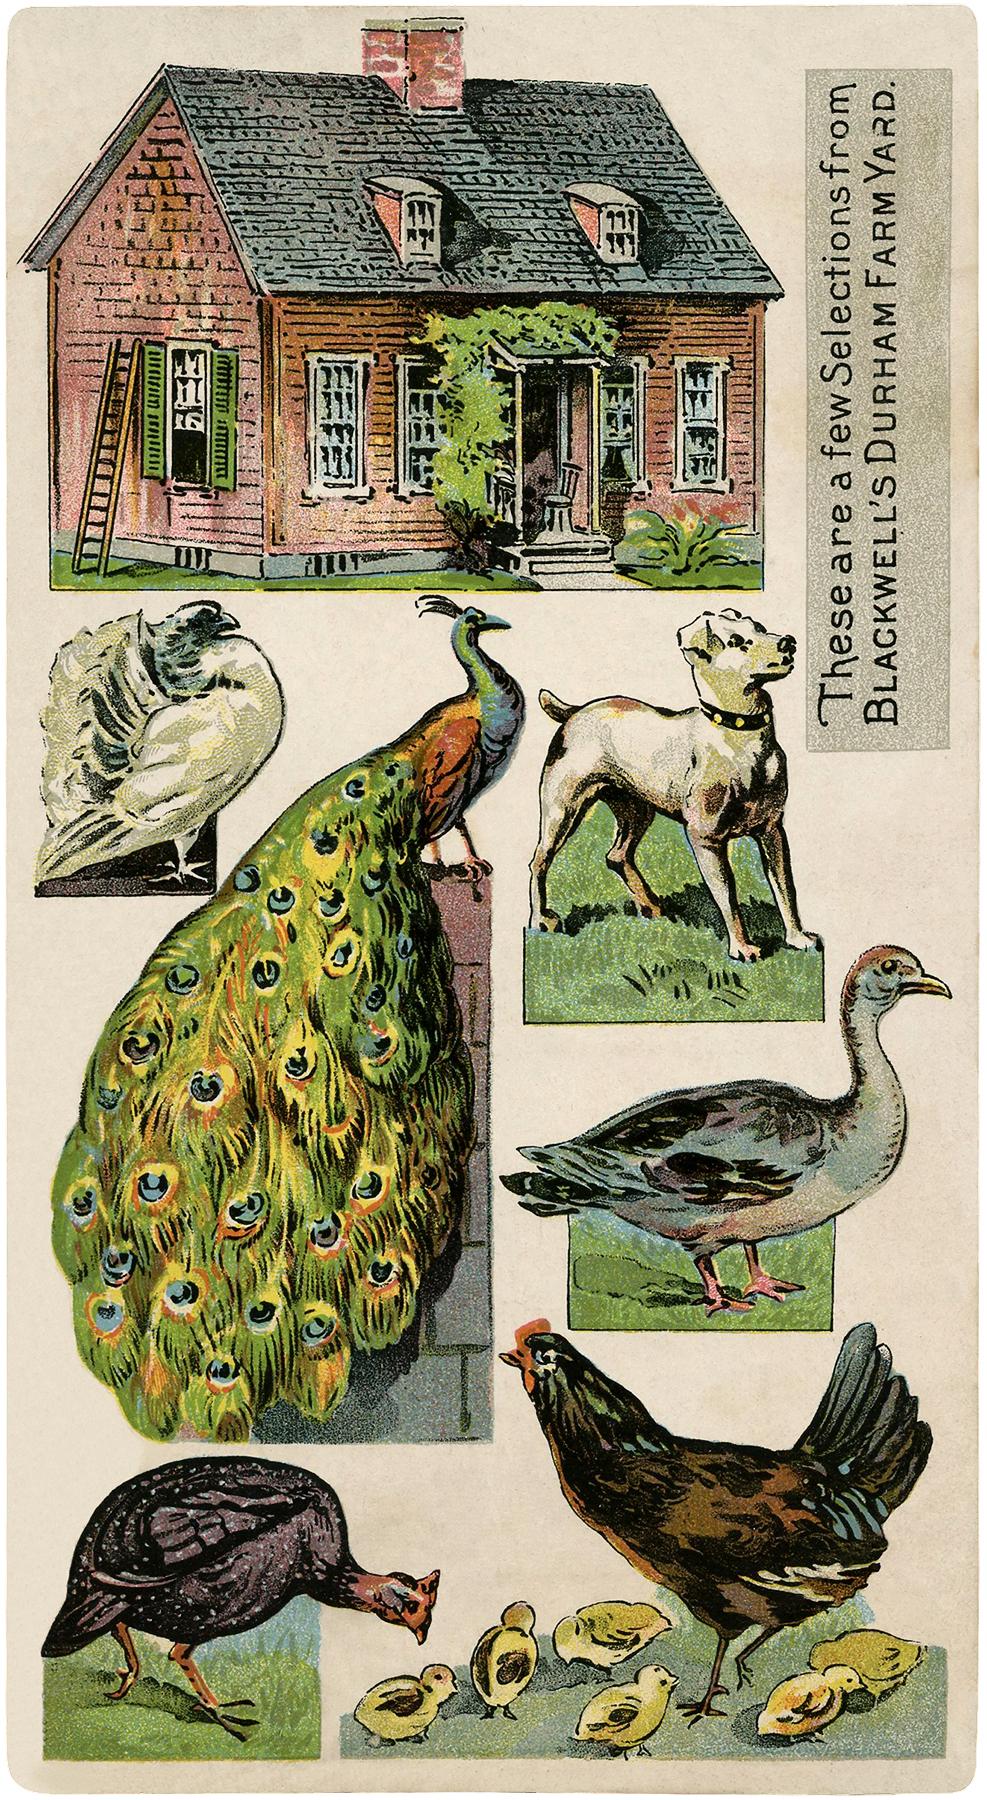 Cute Vintage Printable Farm Image The Graphics Fairy